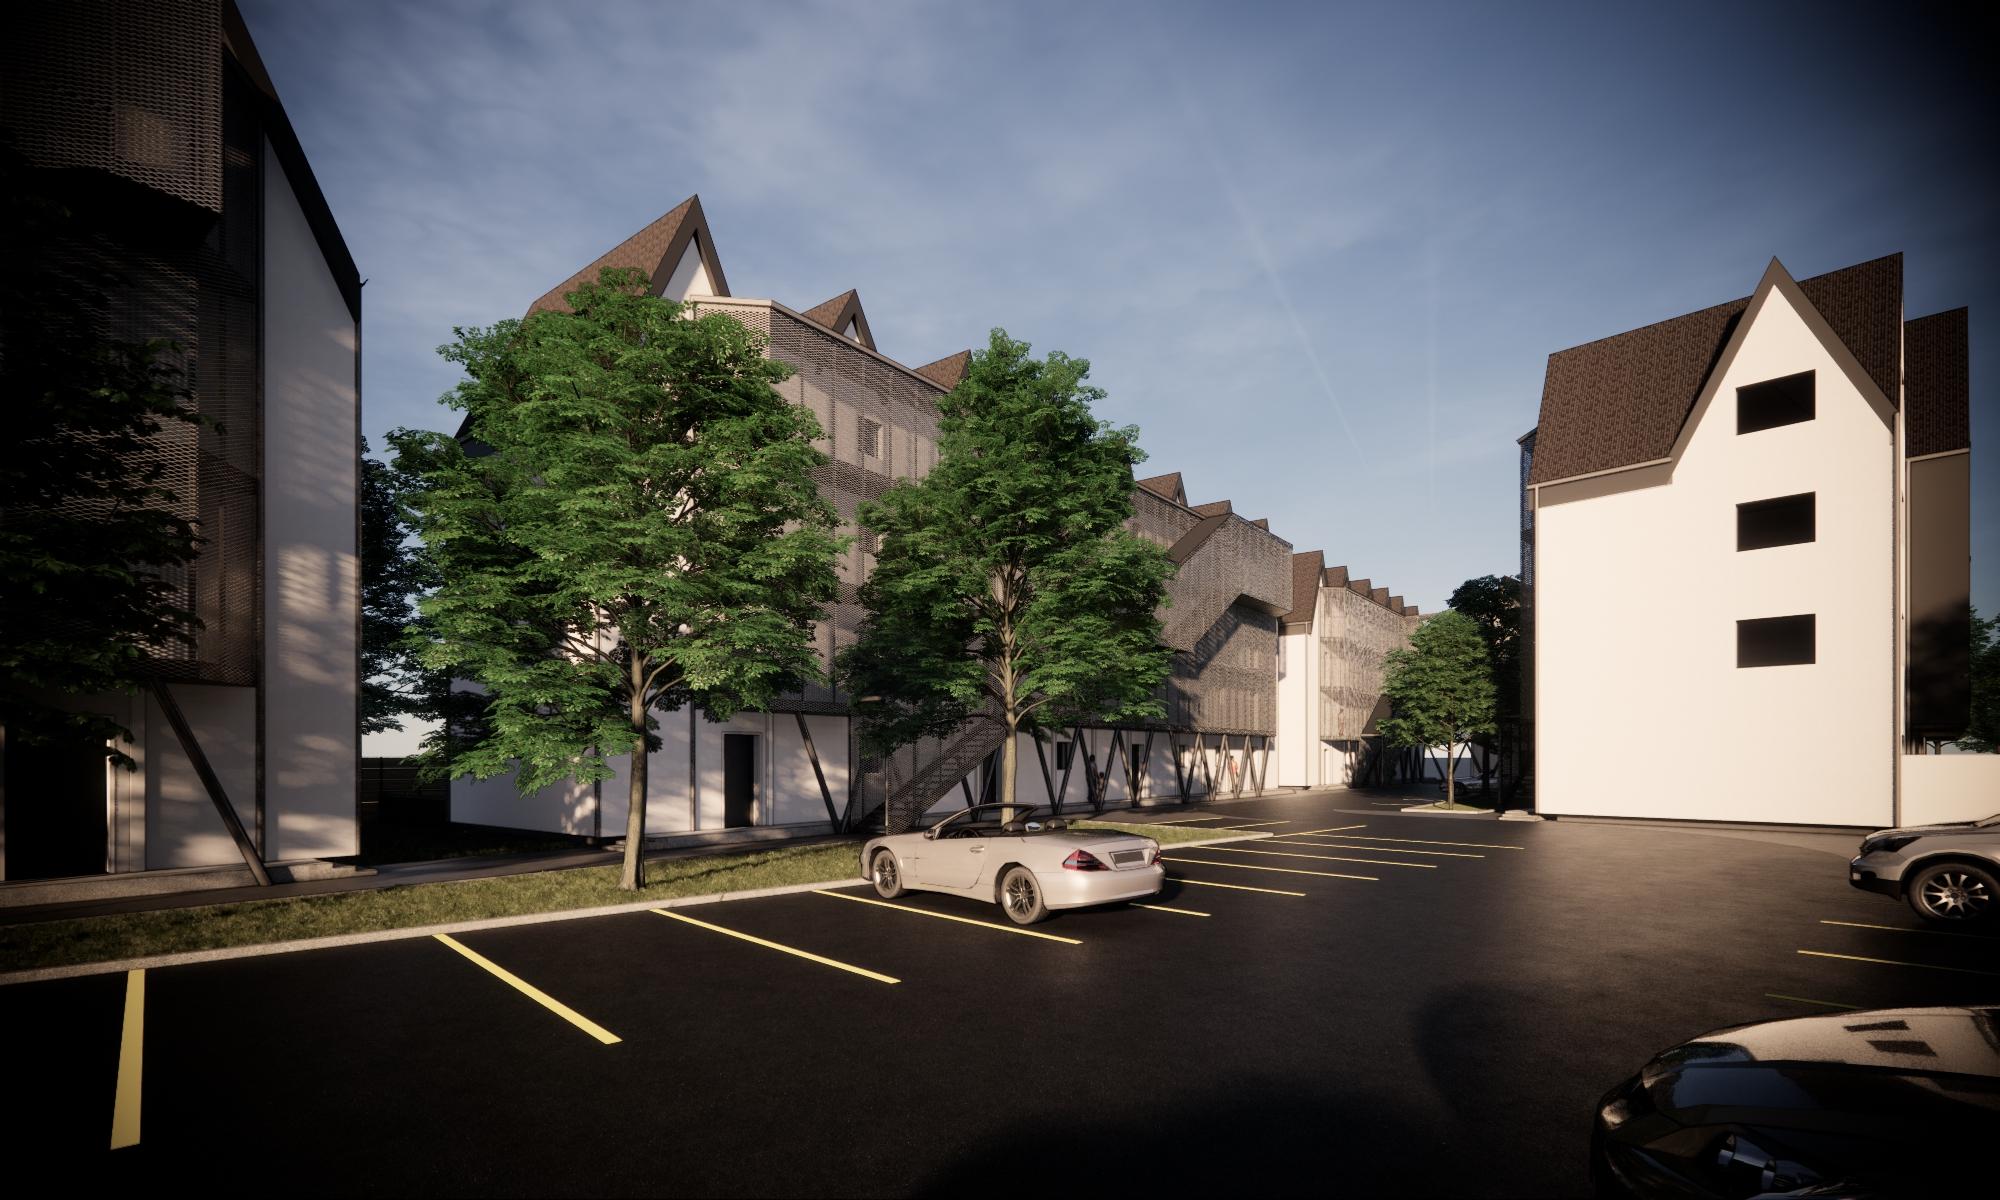 https://nbc-arhitect.ro/wp-content/uploads/2020/10/NBC-Arhitect-_-residential-_-Glad-Bragadiru-_-Romania_4.jpg